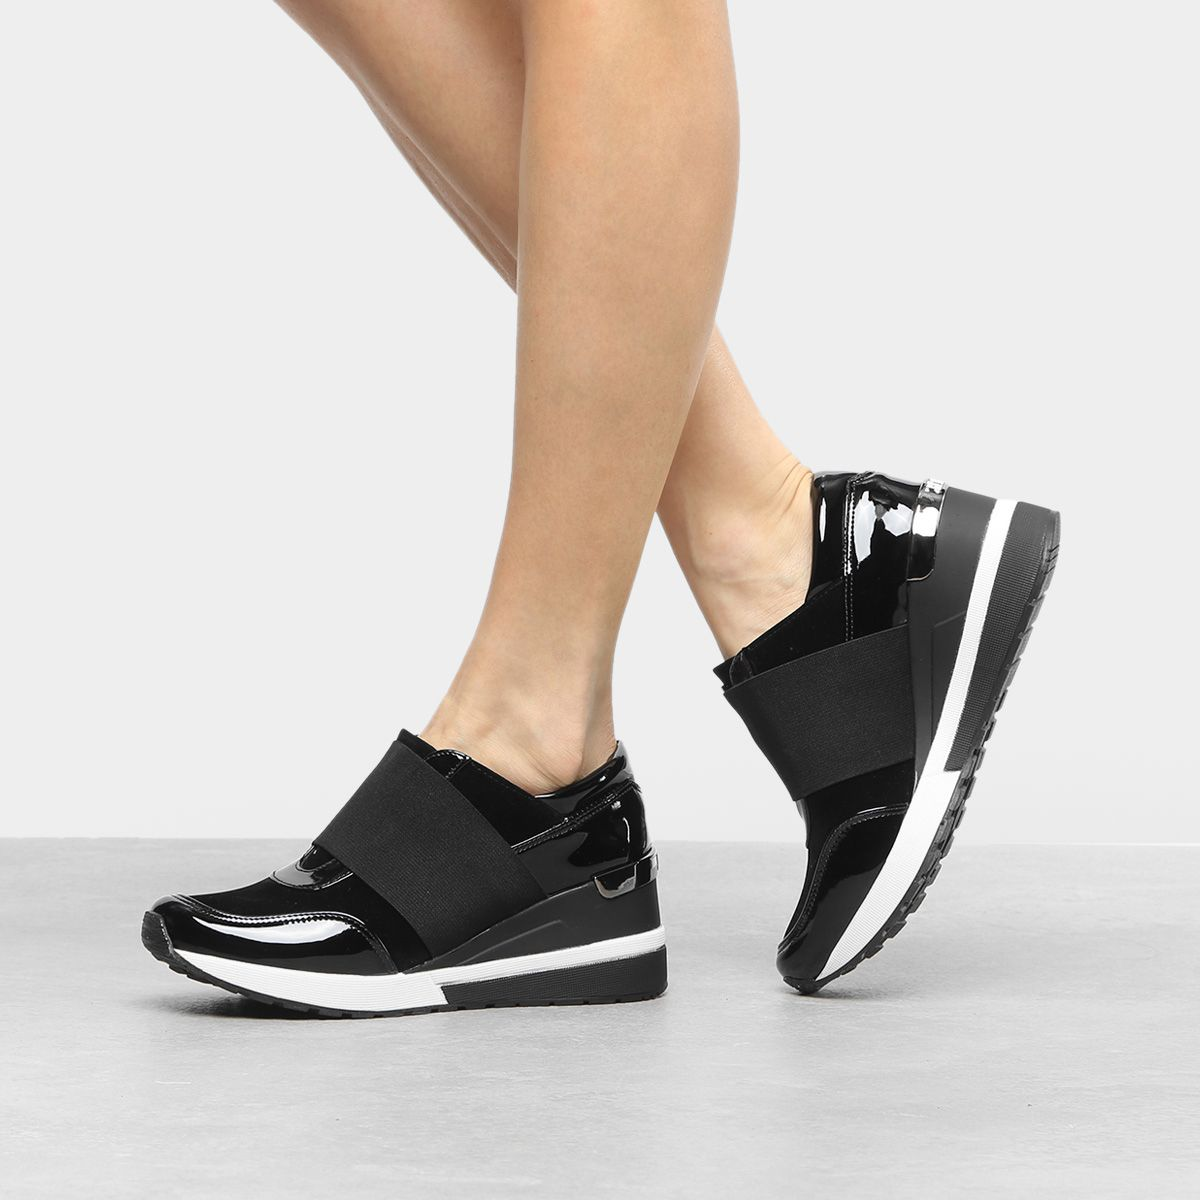 215fc25e3 Tênis Santa Lolla Sneaker Elástico Verniz Feminino - Preto - Compre Agora    Zattini #tênis